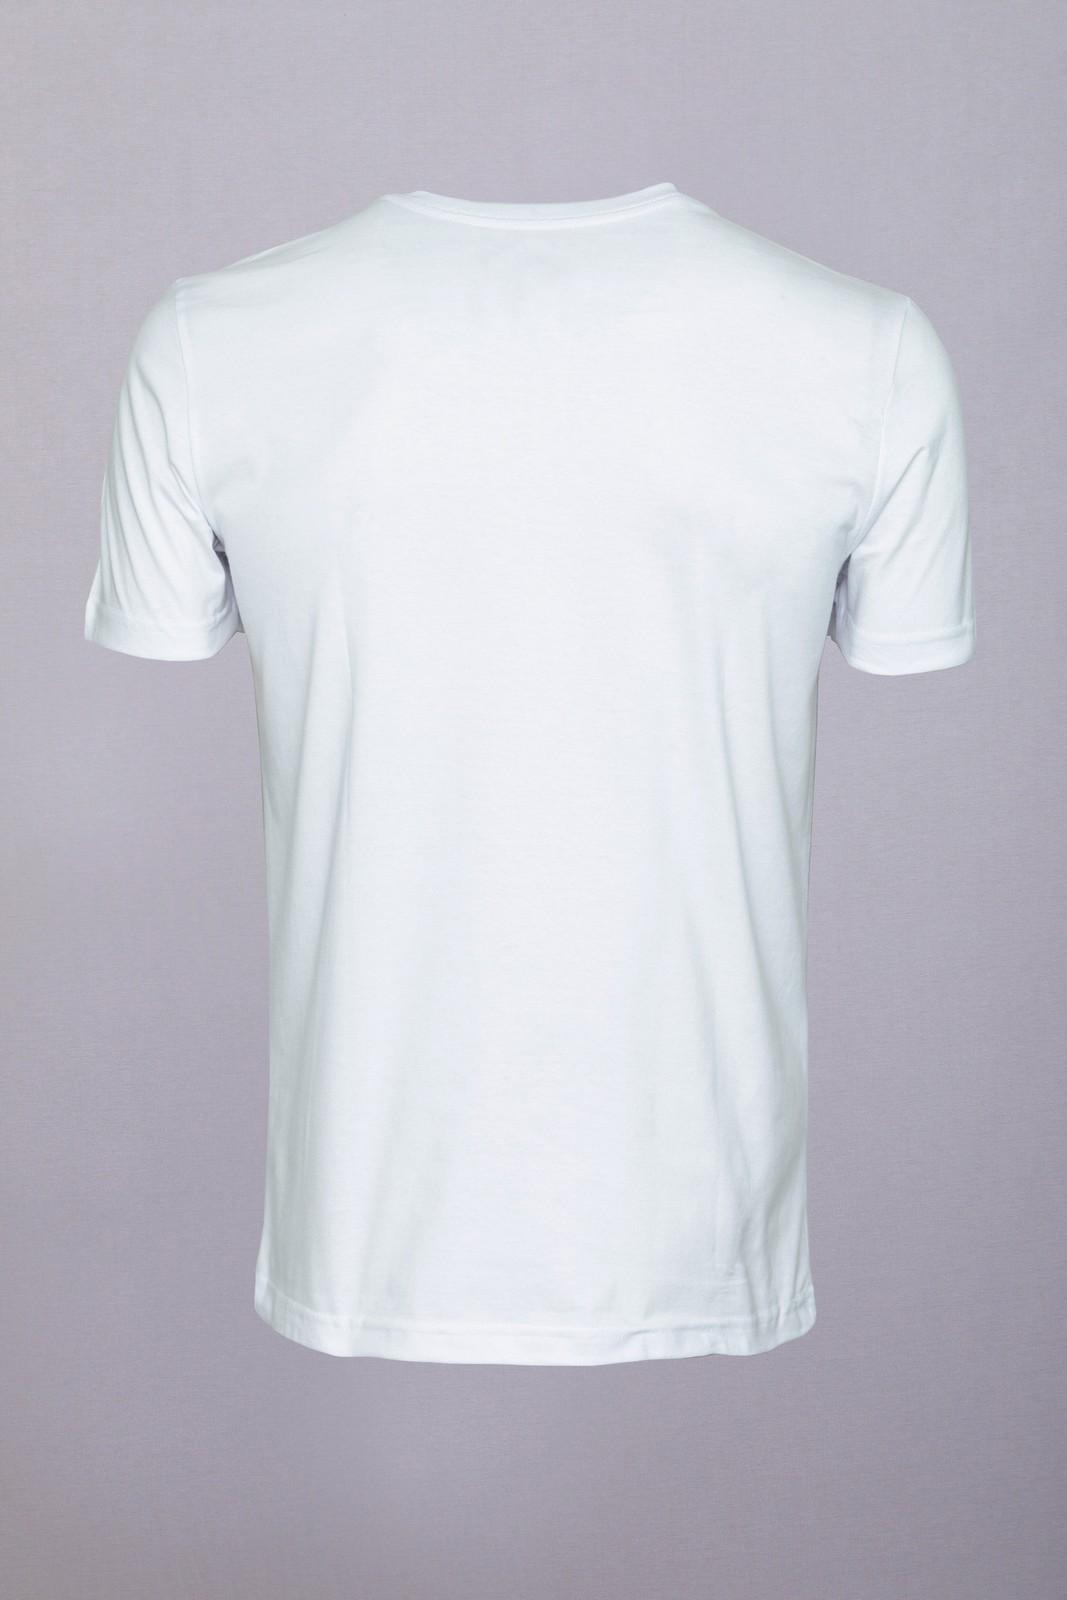 Camiseta CoolWave Maybe I'll Go, Maybe I'll Stay Branca